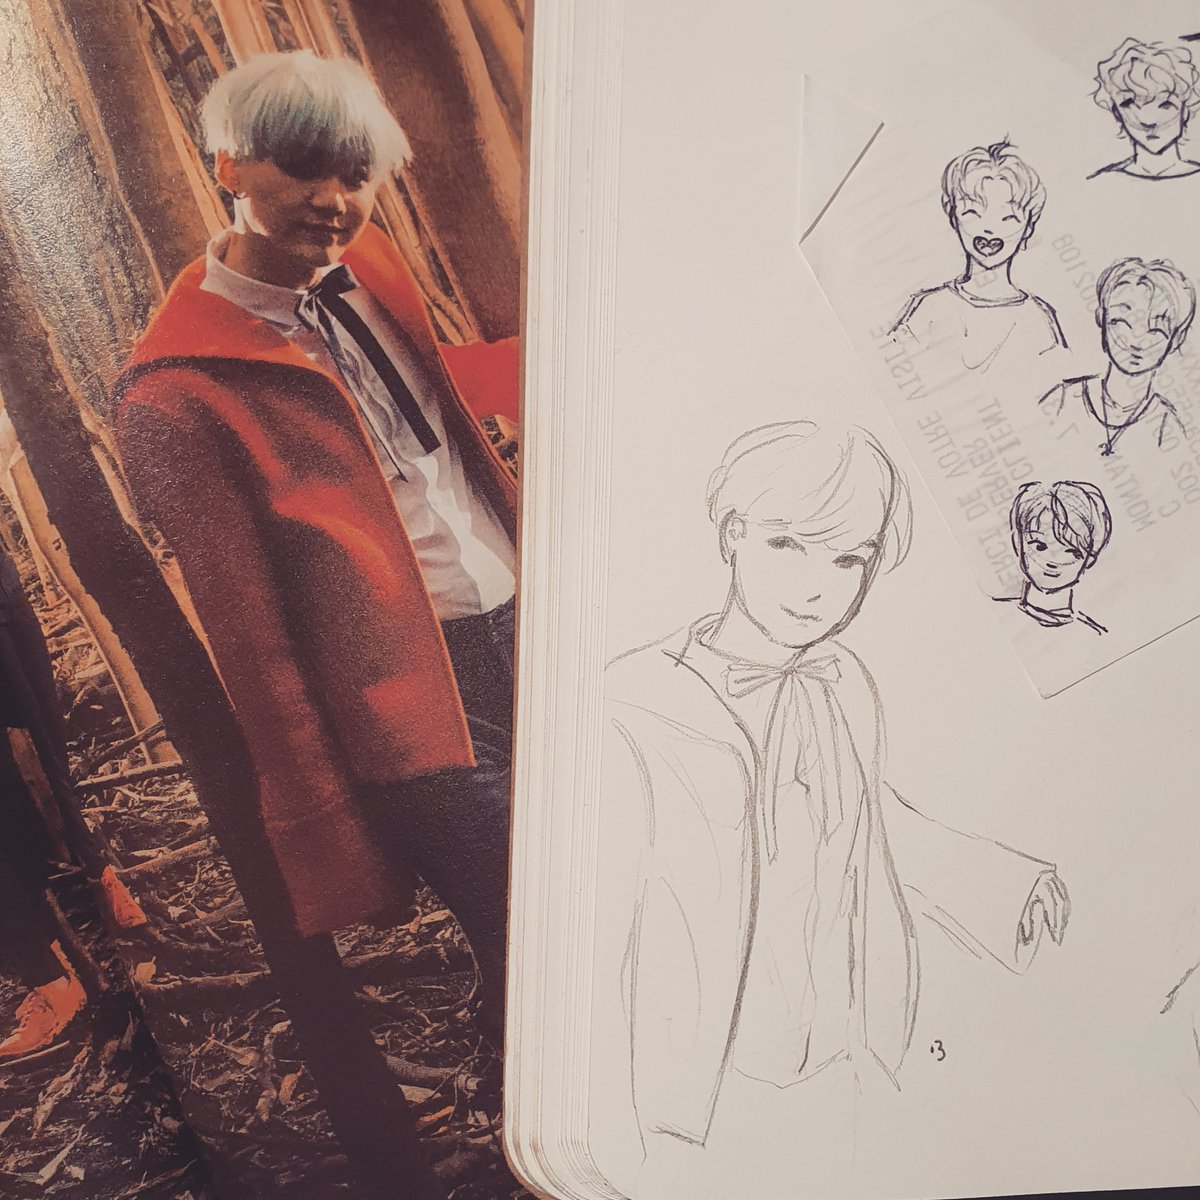 A cute little Yoongi, but not round enough I'd say #minyoongi #yoongi #suga #btssuga #bts #bangtansonyeondan #btsfanart #sketch #sketchbook #drawing #art #bangtan #onebangtanaday #baguettesarmysxart #hyyhpt2 #hyyh #themostbeautifulmomentinlifept2